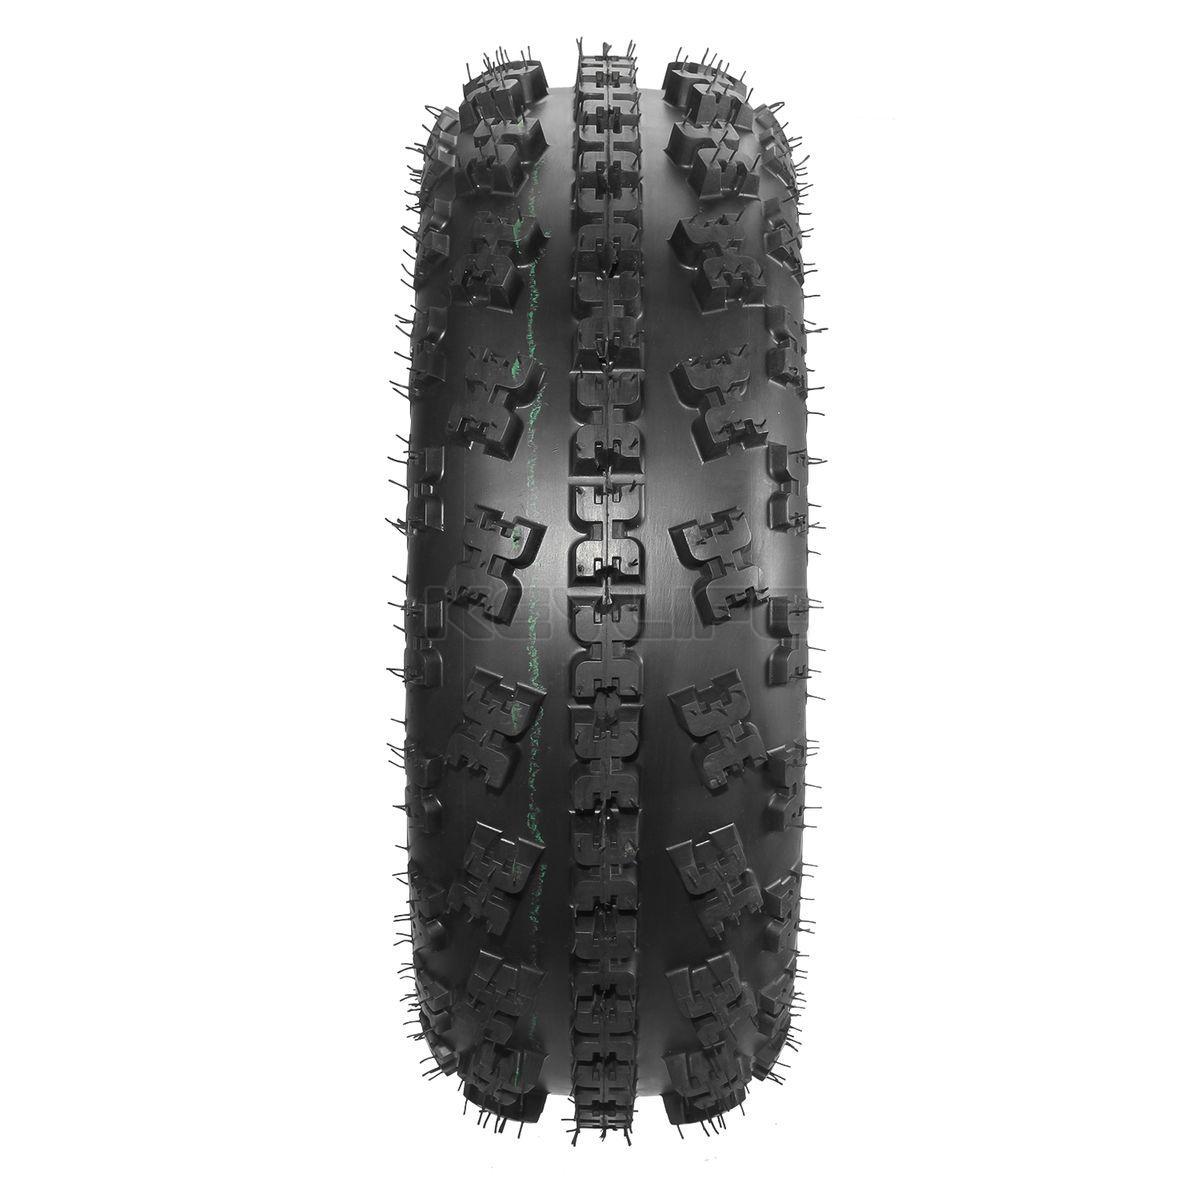 21x7-10 21x7x10 Yamaha Blaster 200 Banshee 350 ATV Front Tire Set 6PR 2